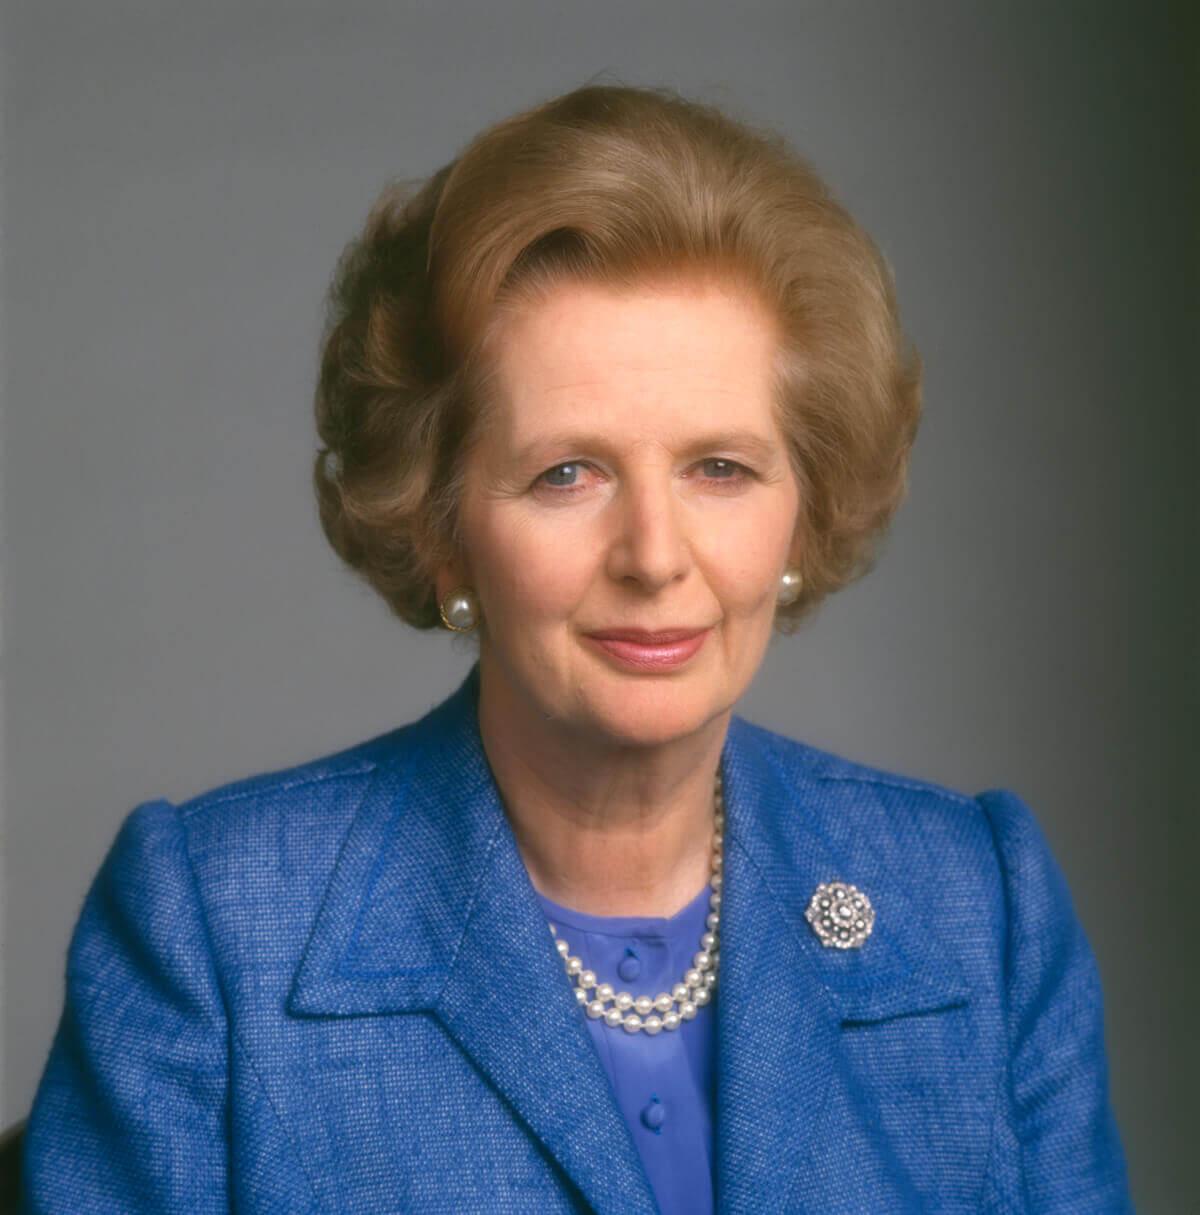 Best quotes by Margaret Thatcher